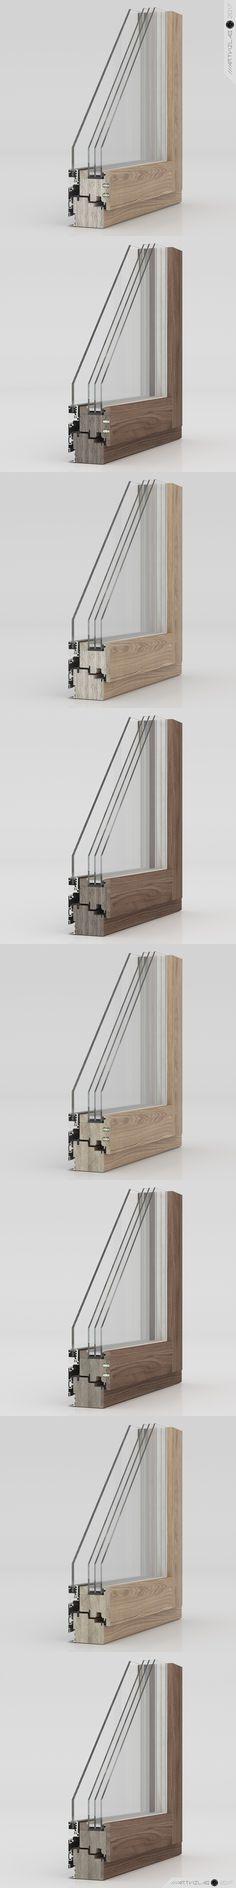 ARTVIZLAB | 3D renderings of windows and doors | 3d@artvizlab.com #render #rendering #artwork #artvizlab #wood #windows #glasses #walnut #oak #lvl #view #2017 #november #разрез